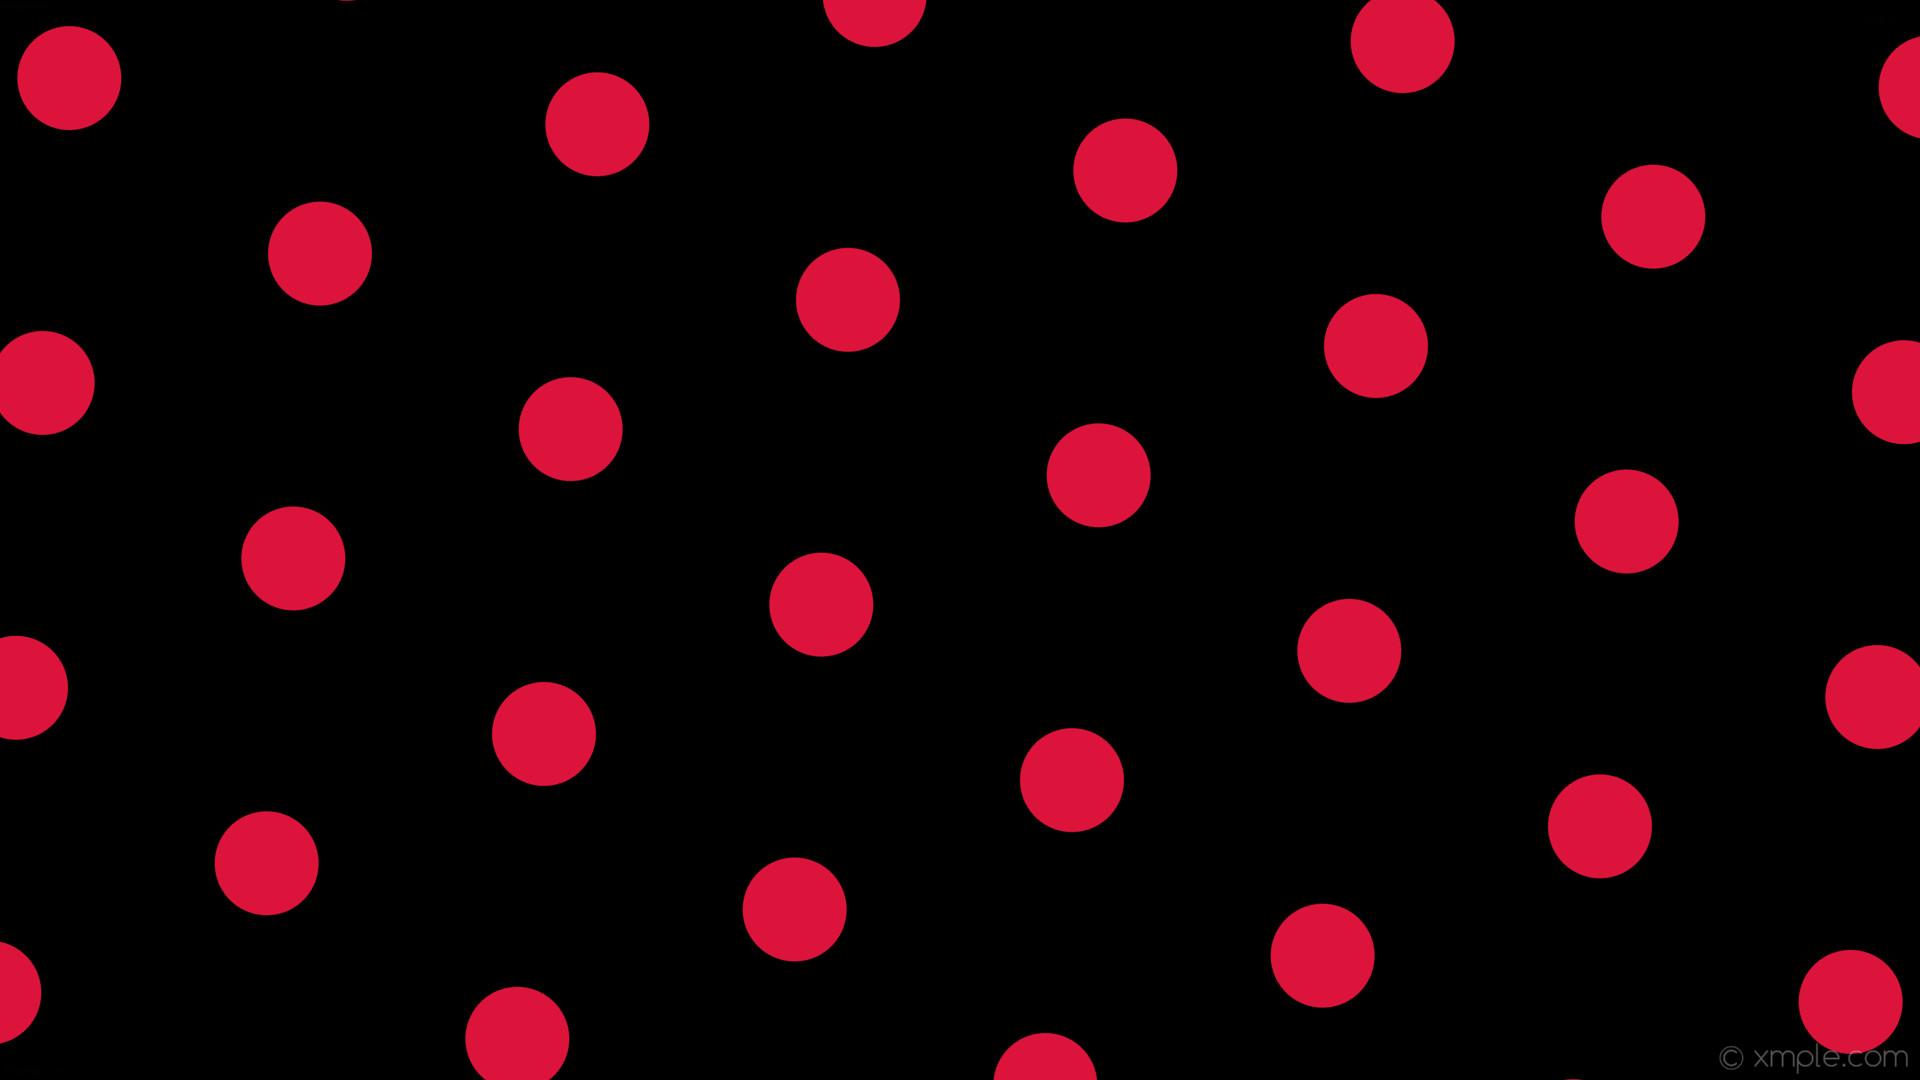 wallpaper dots black red polka hexagon crimson #000000 #dc143c diagonal 25°  104px 306px